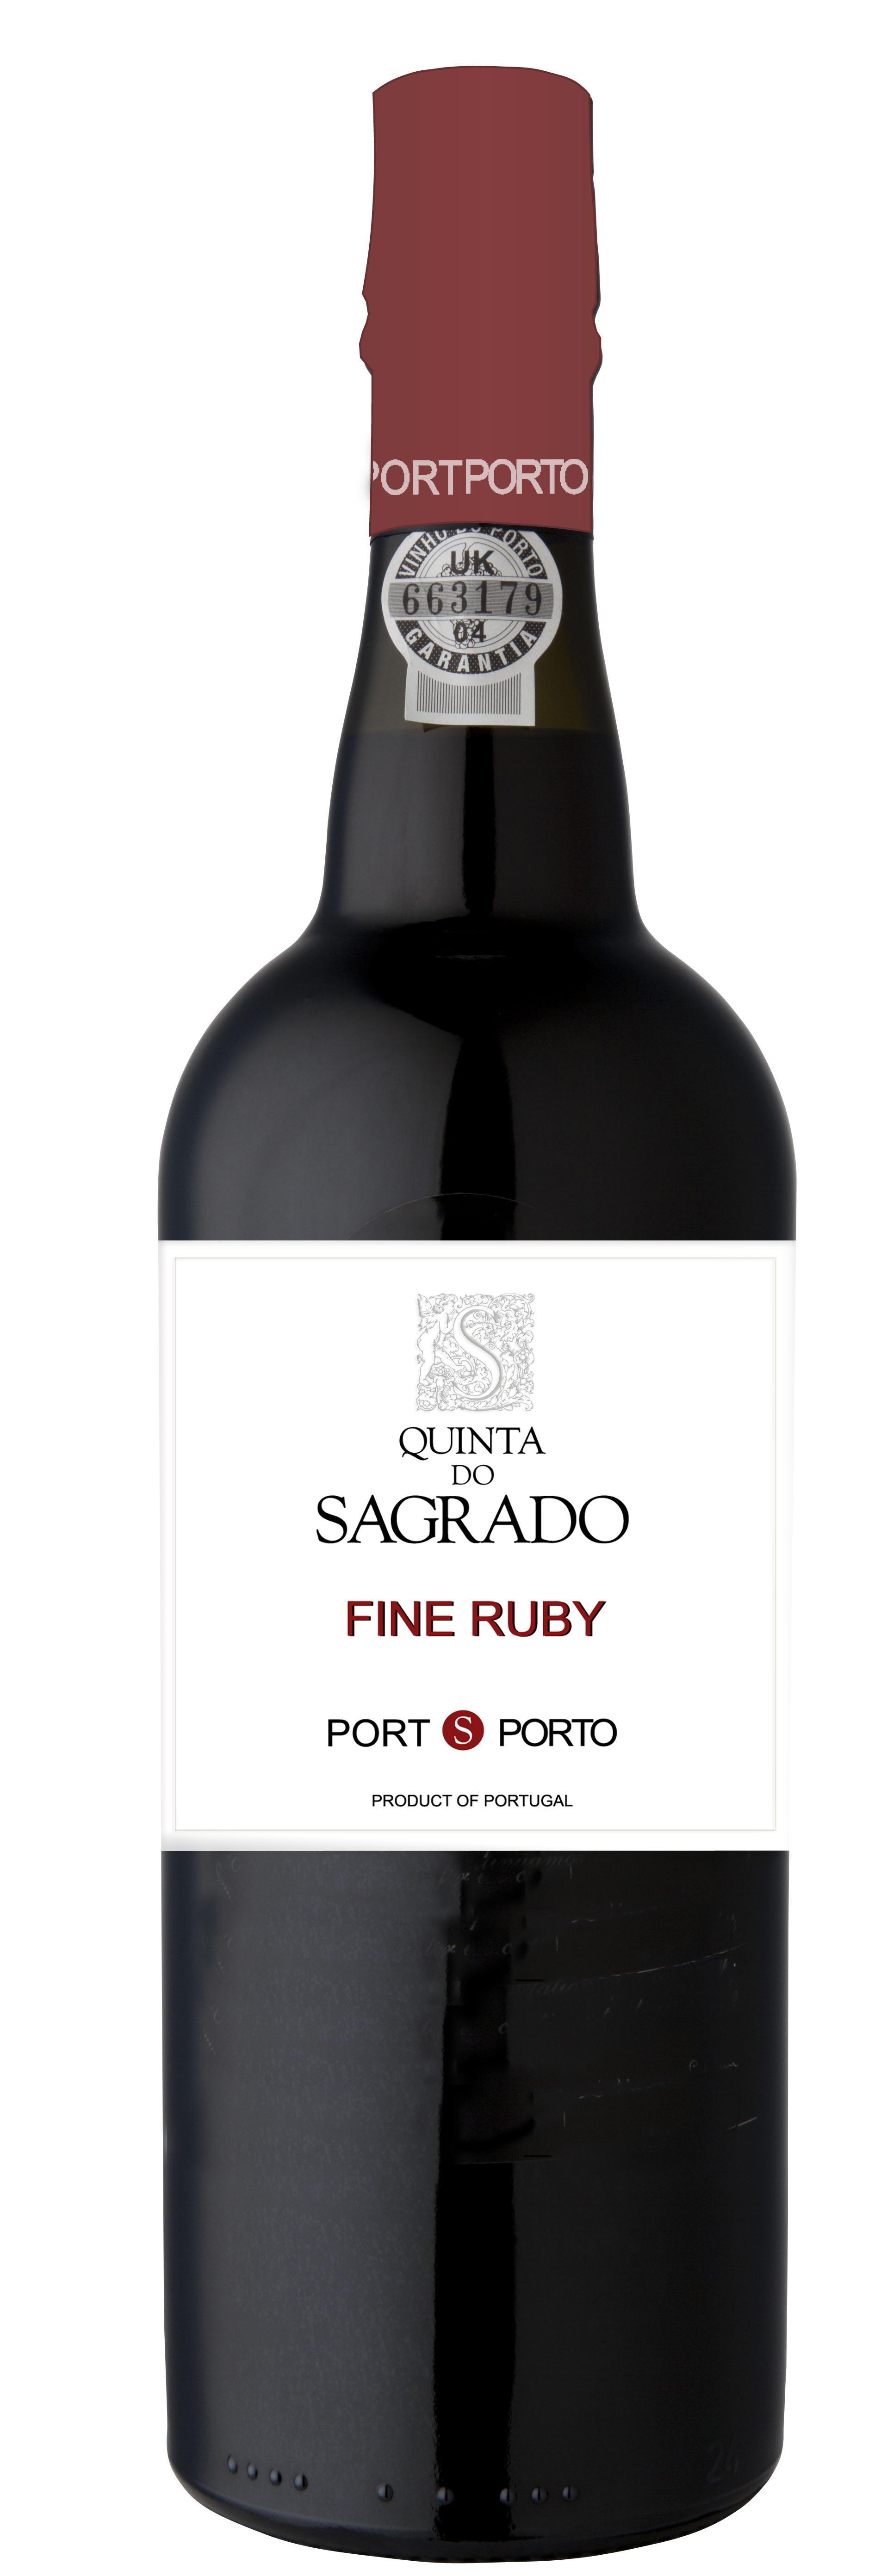 Quinta do Sagrado Fine Ruby